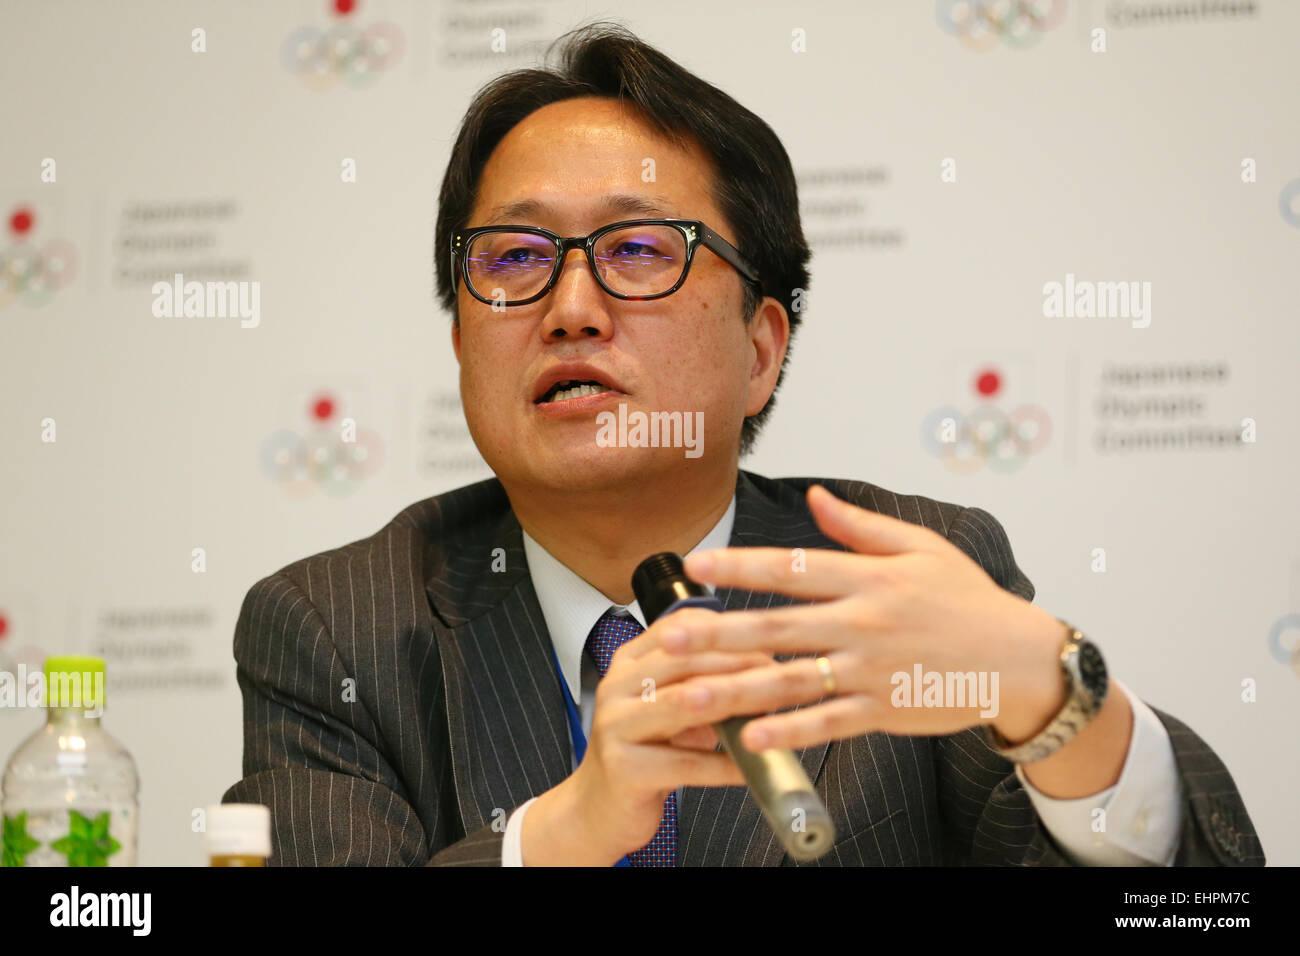 Shuichi Takano, MARCH 16, 2015 : Management seminars for sports organizations are held at Ajinomoto National Training Stock Photo